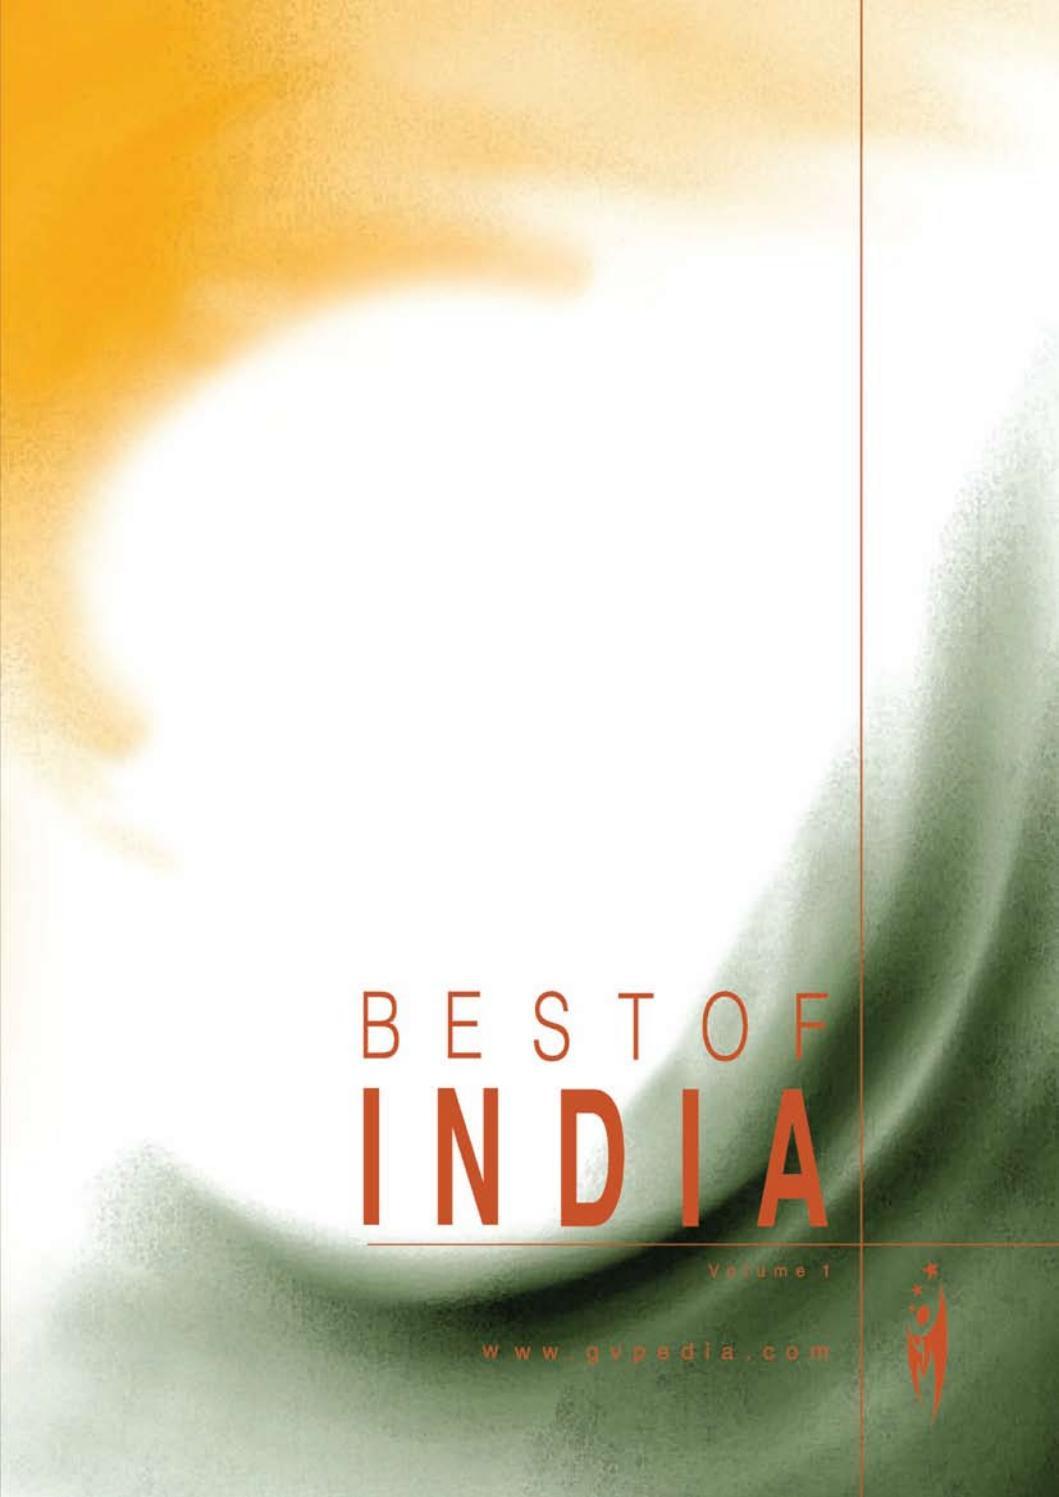 BEST OF INDIA   Volume 20 by Sven Boermeester   issuu